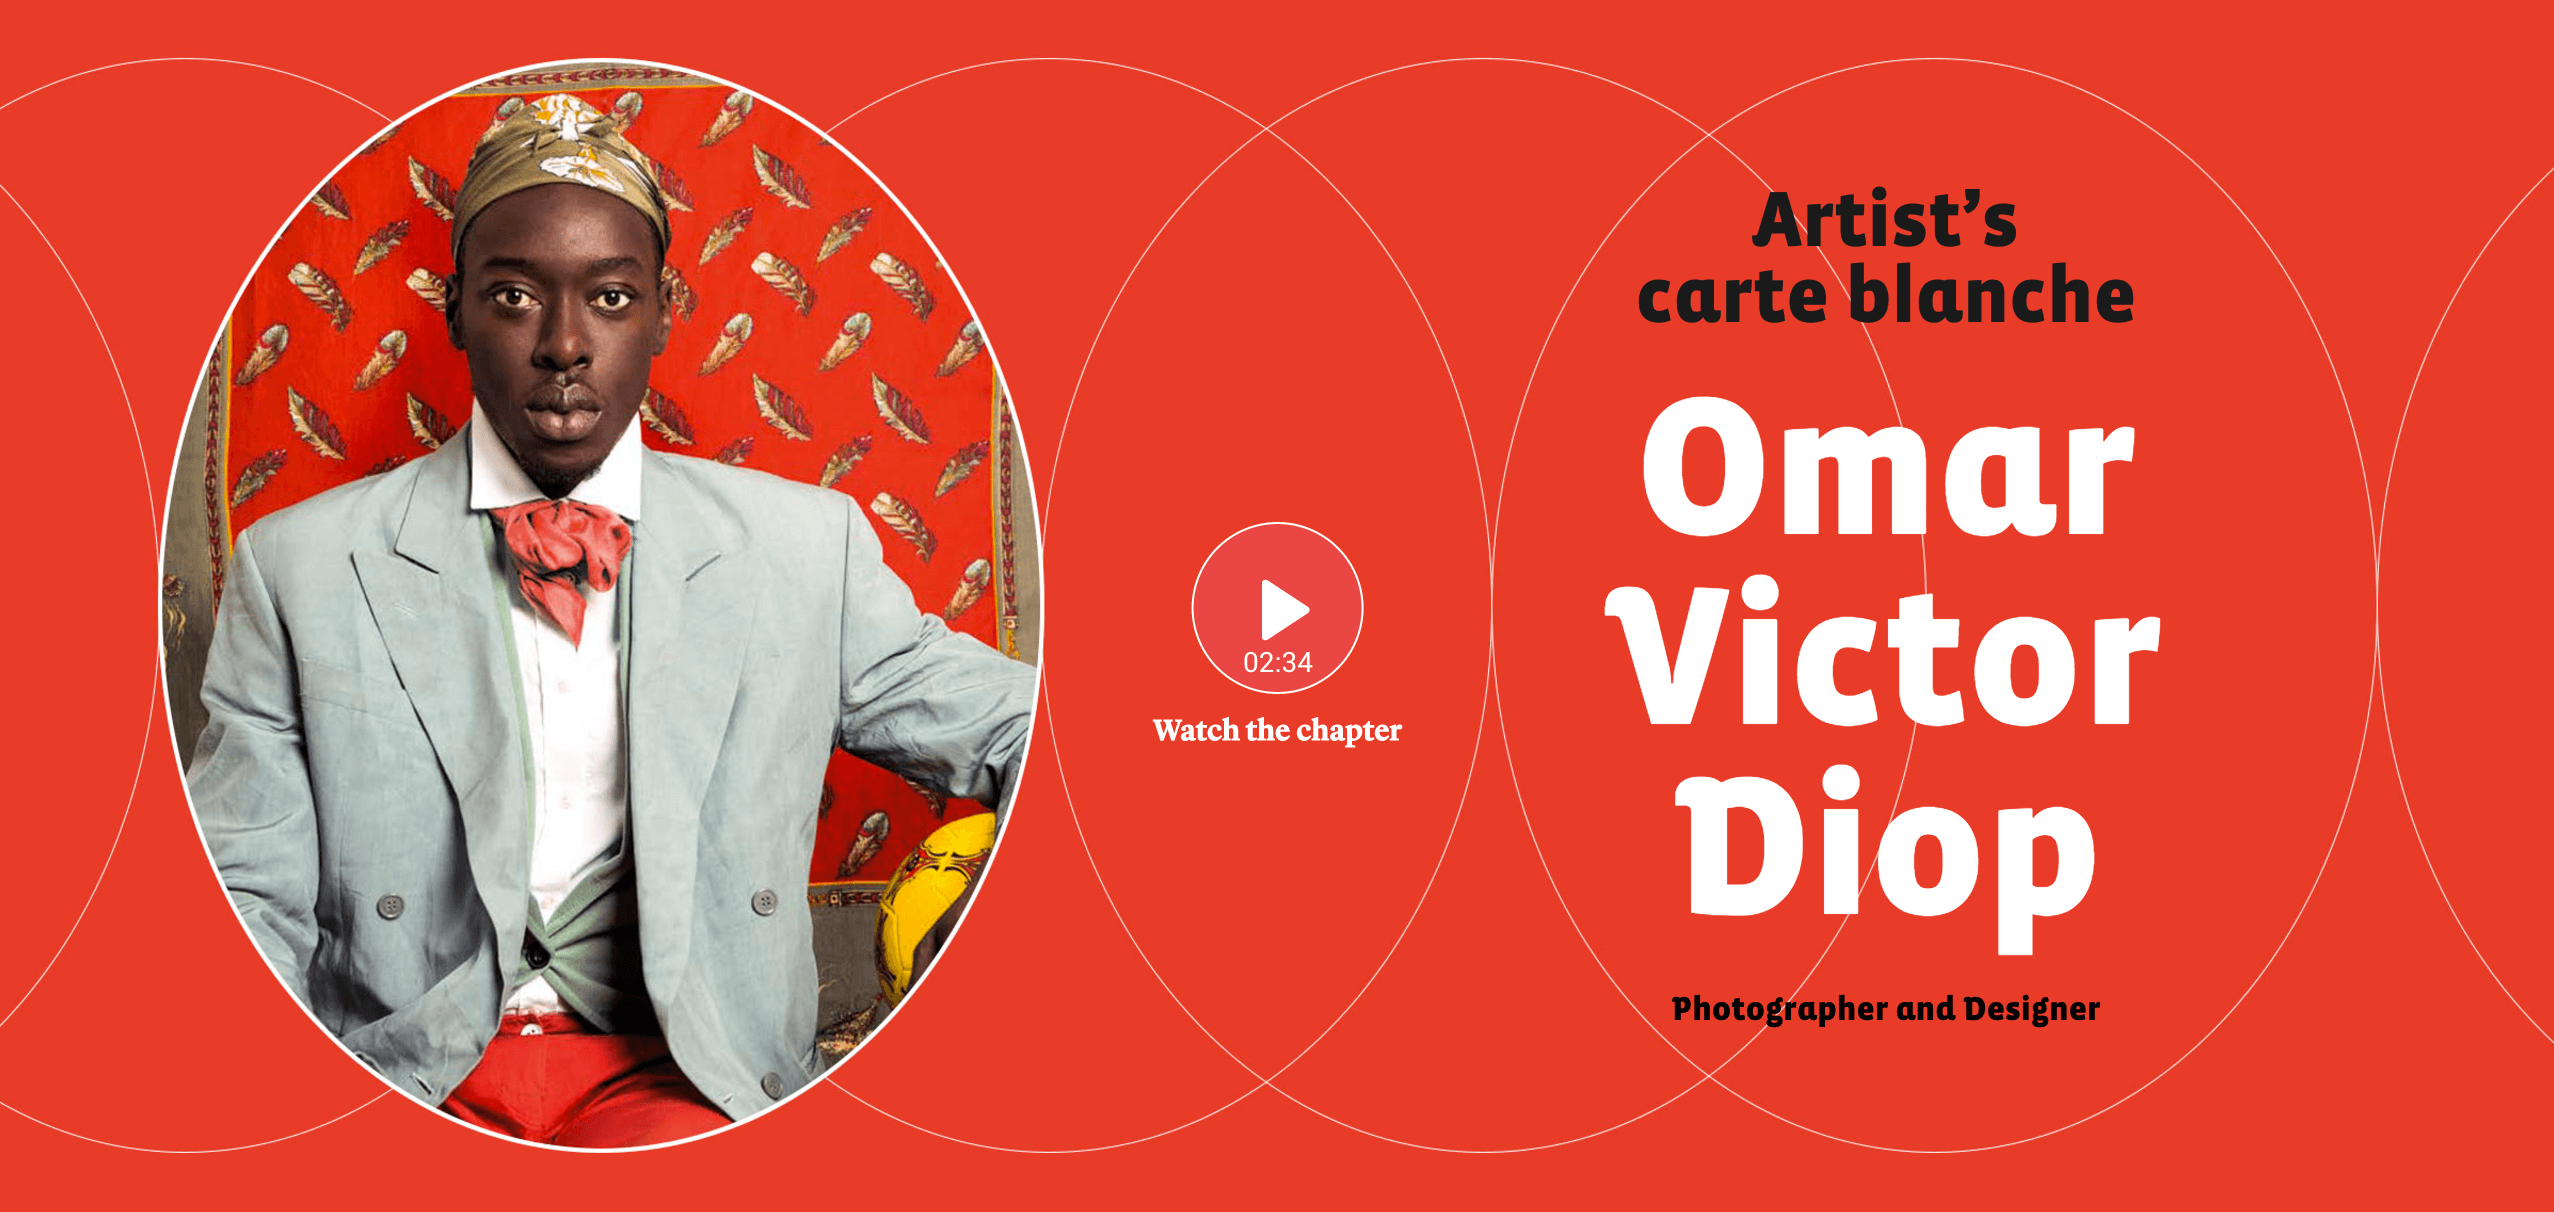 Omar-Victor-Diop